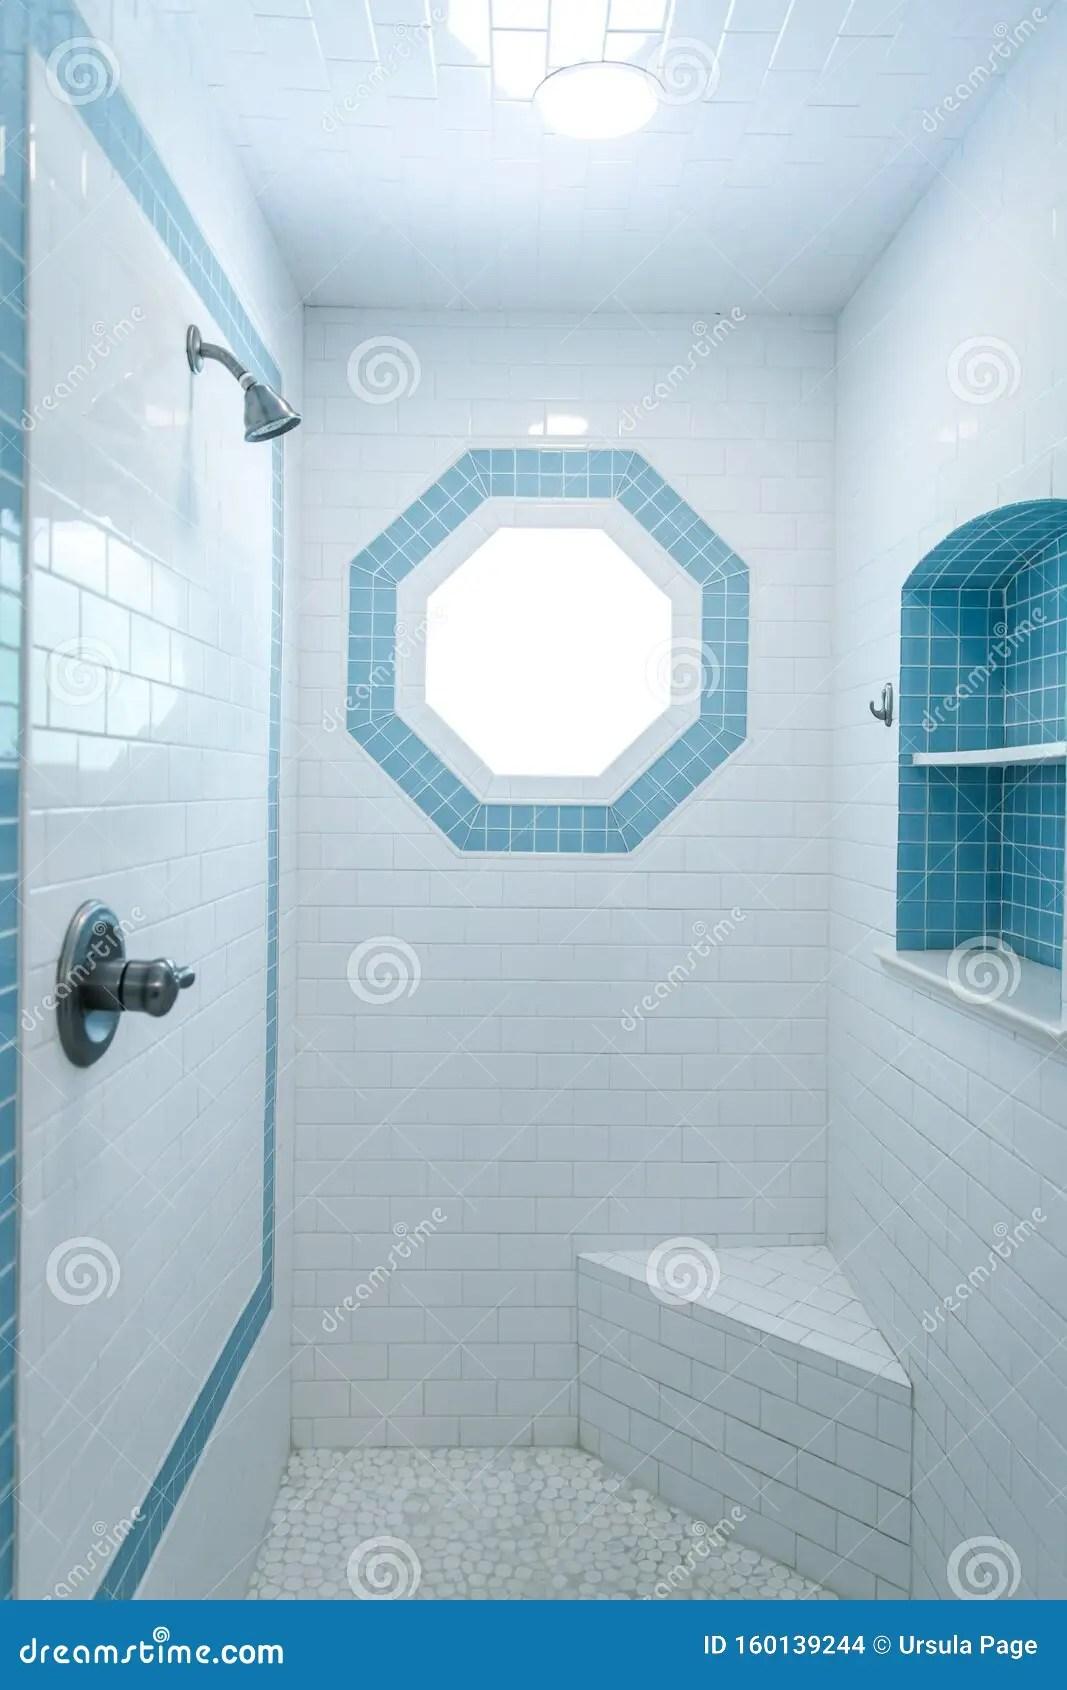 https www dreamstime com s style bathroom shower tile floor white tile walls blue tile accents octogon accent window seat bench image160139244